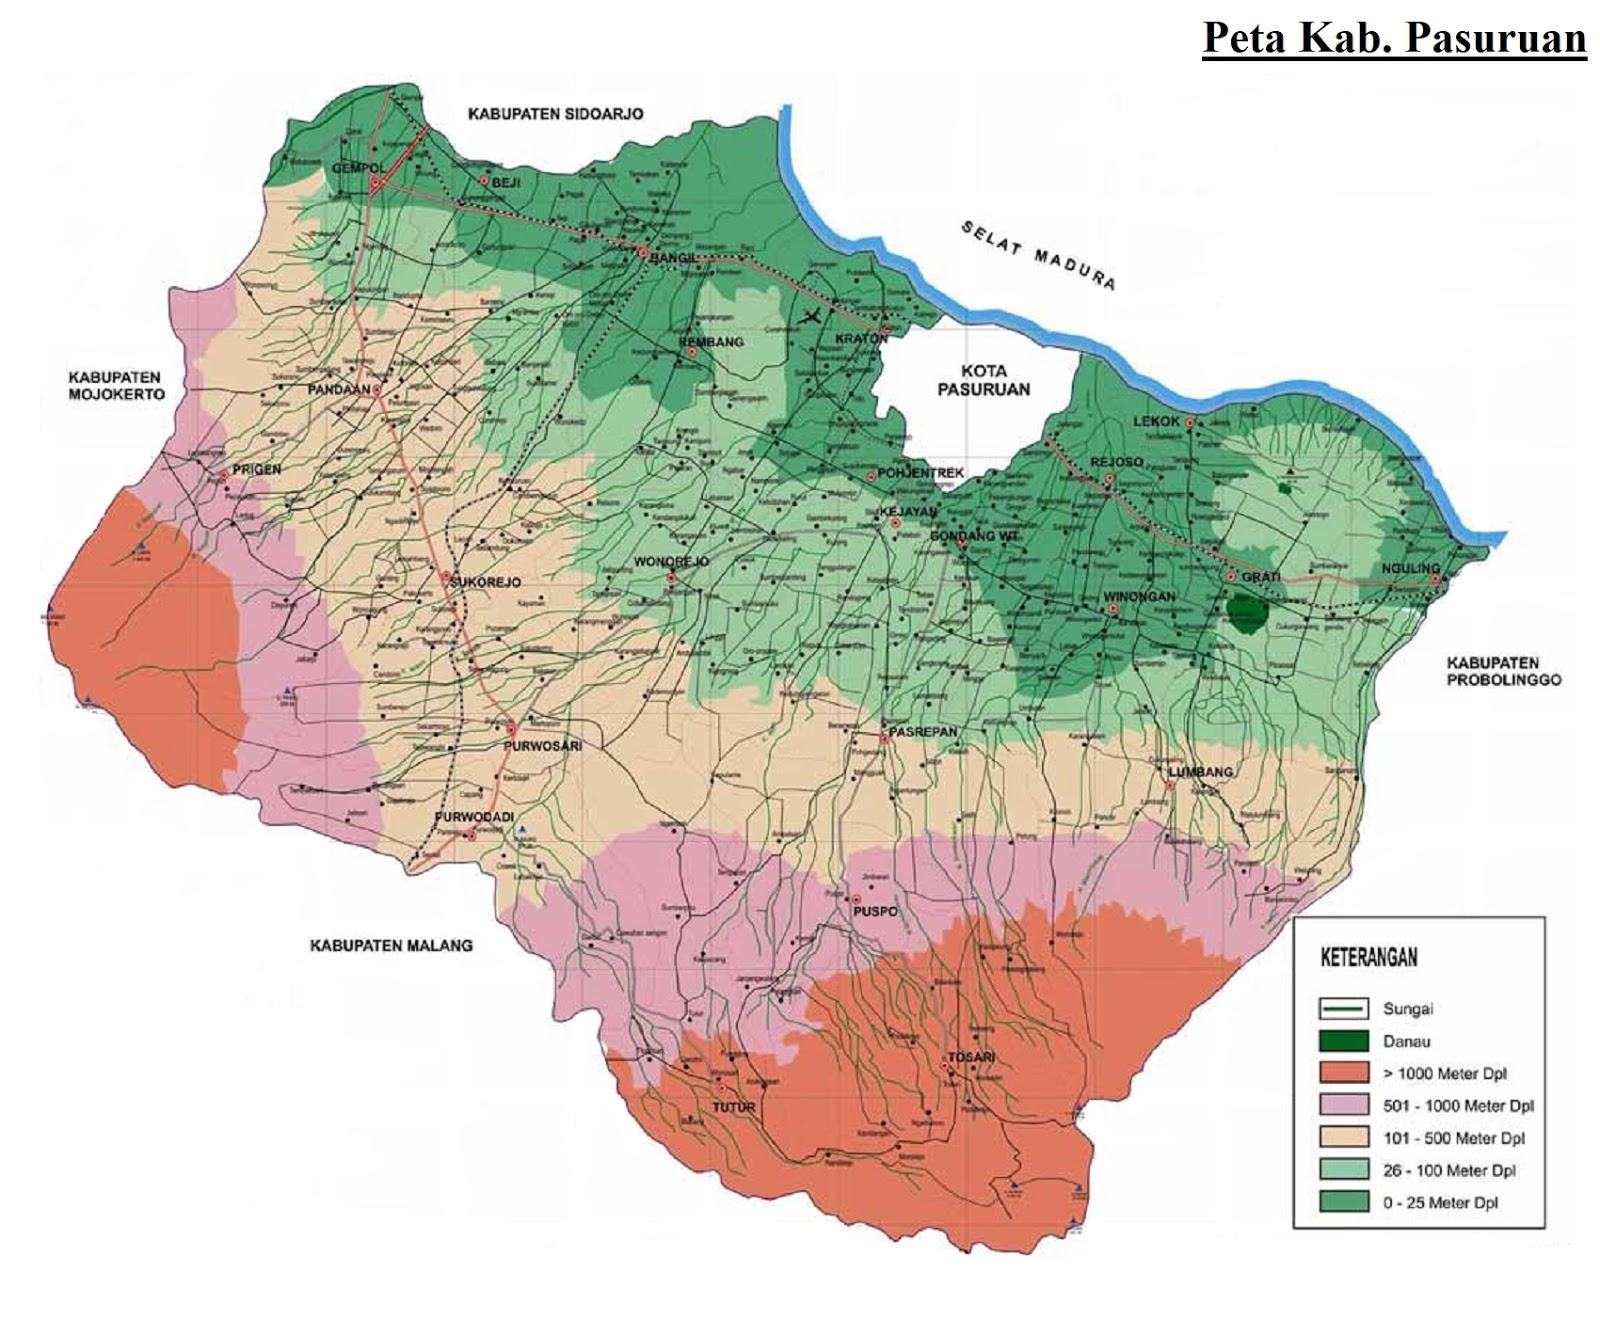 Gambar Peta Kabupaten Pasuruan HD